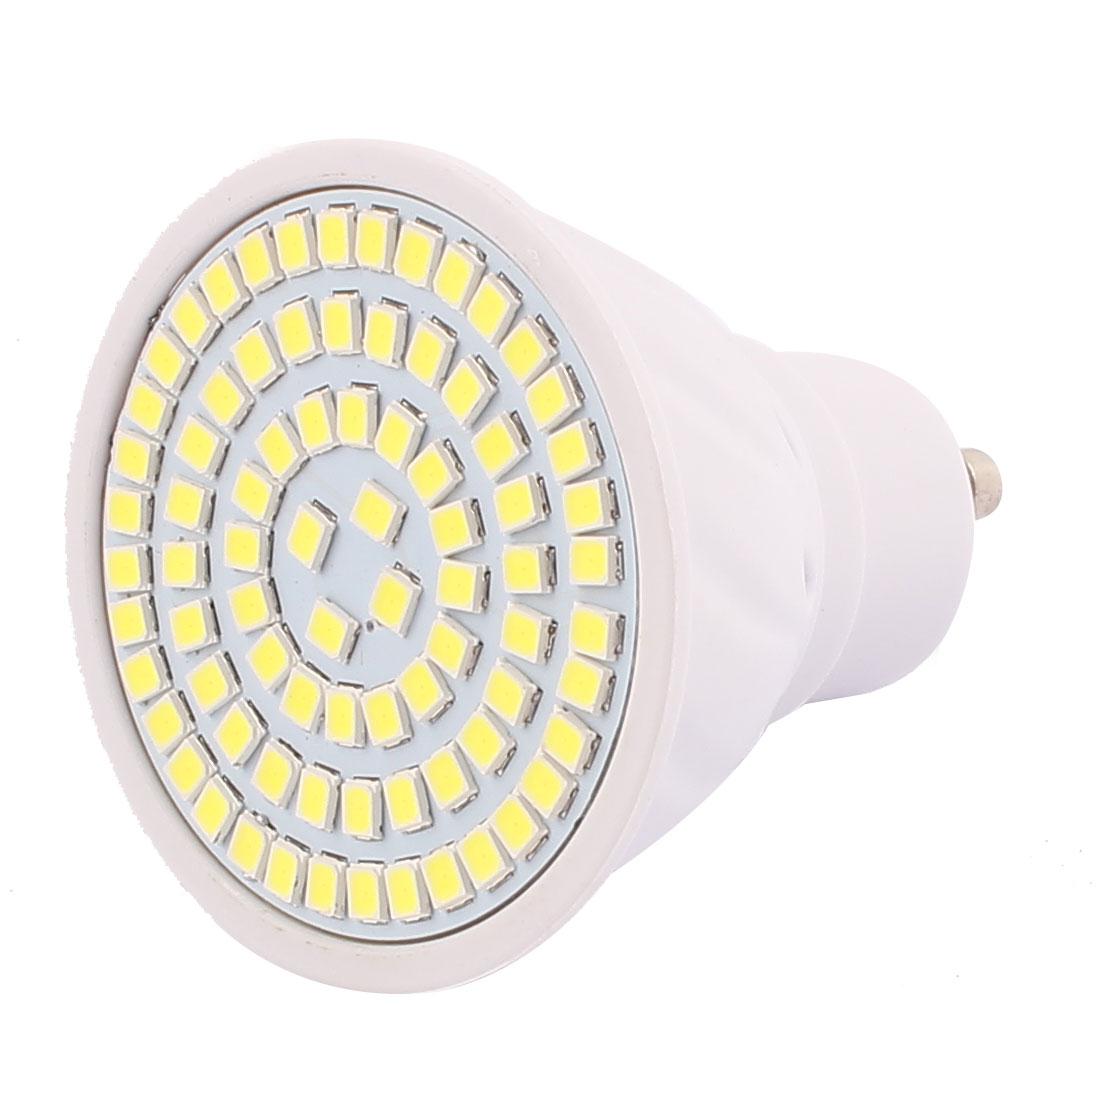 GU10 SMD 2835 80 LEDs Plastic Energy-Saving LED Lamp Bulb White AC 220V 8W